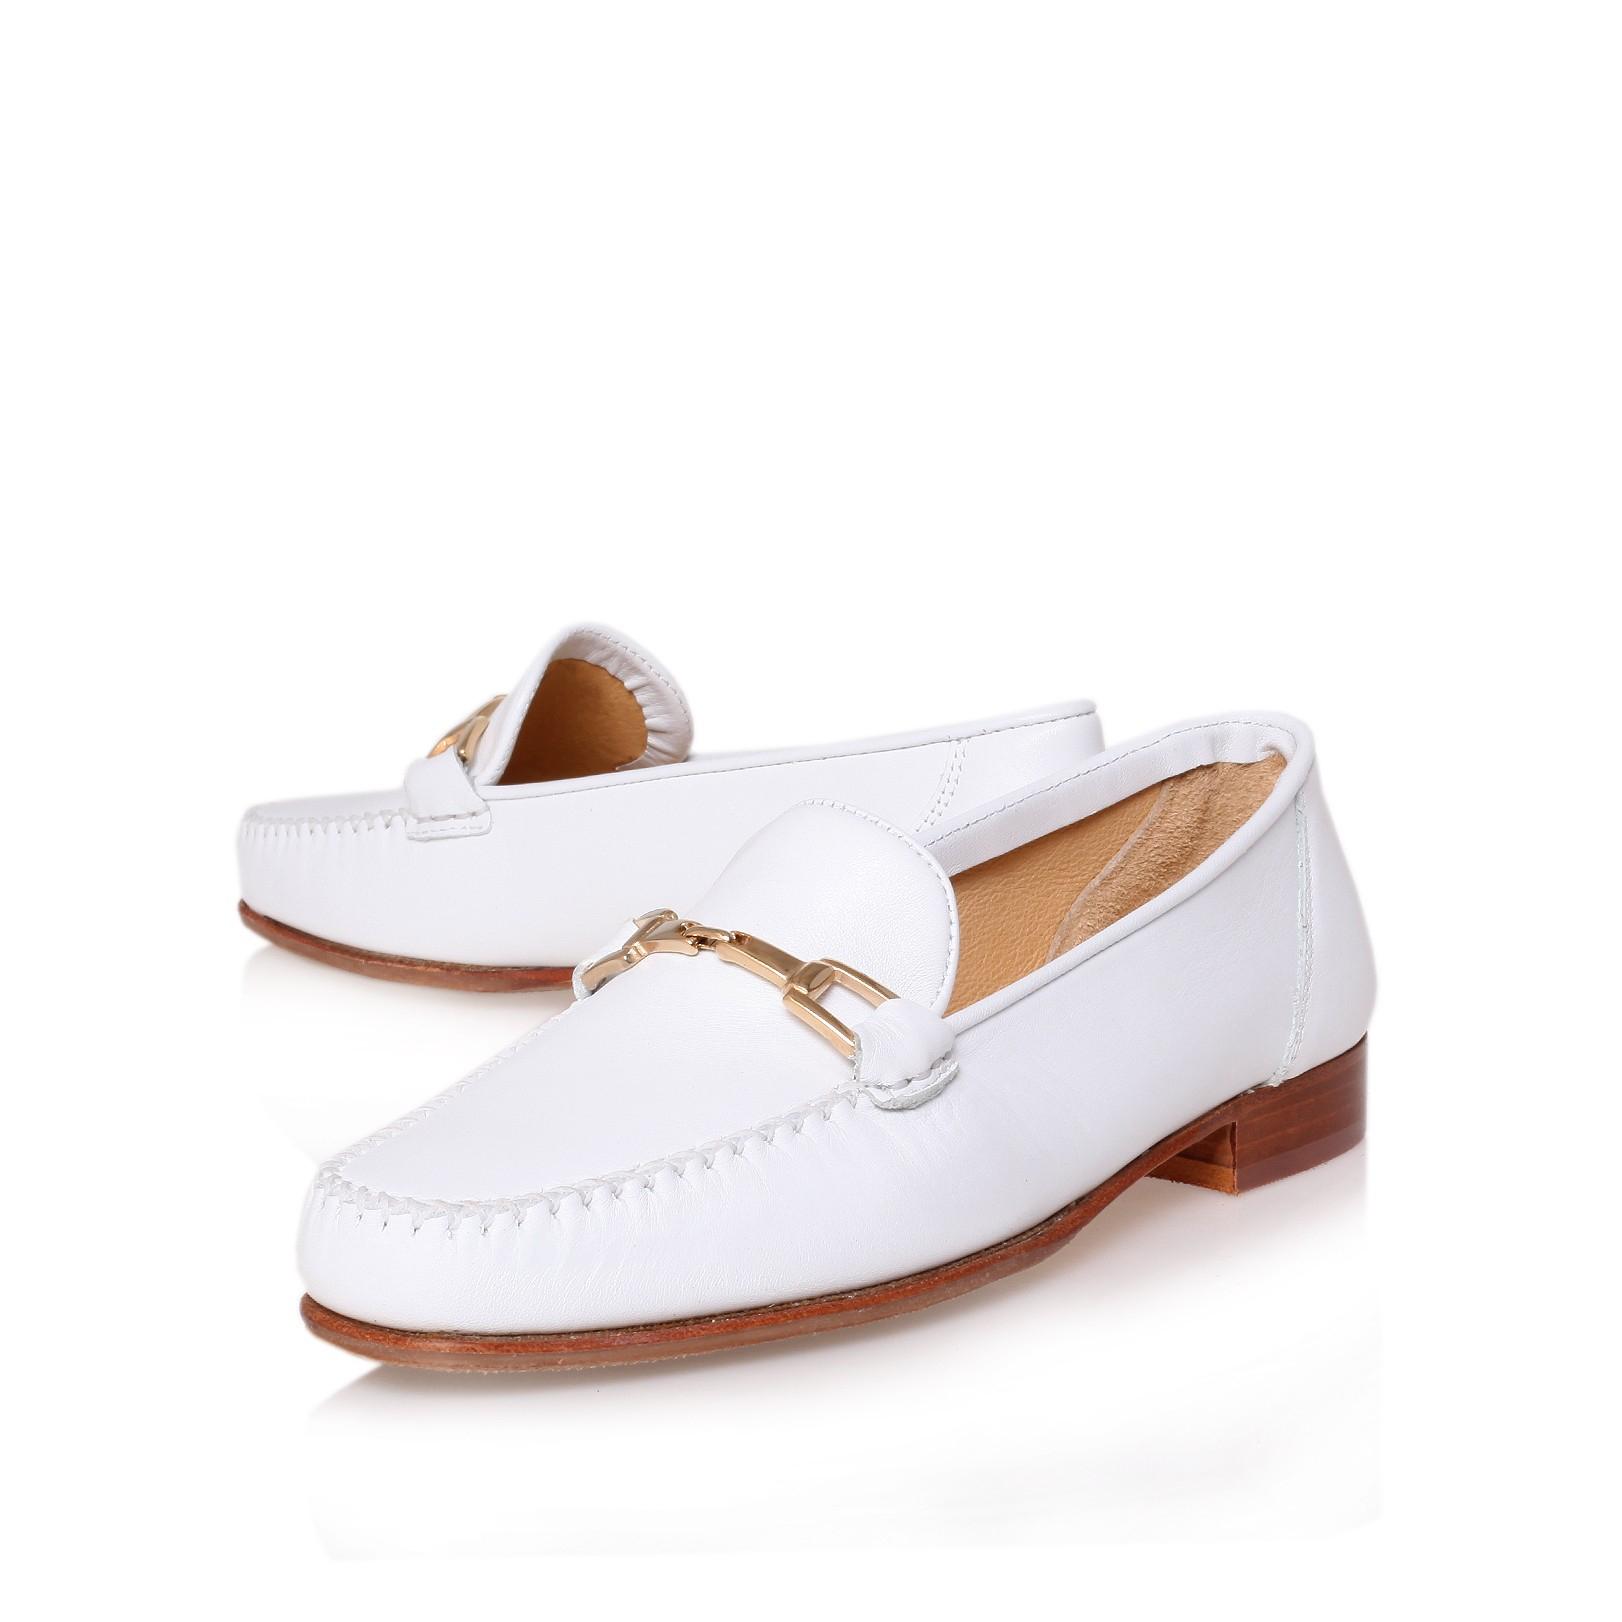 Carvela White Kurt Geiger Shoes